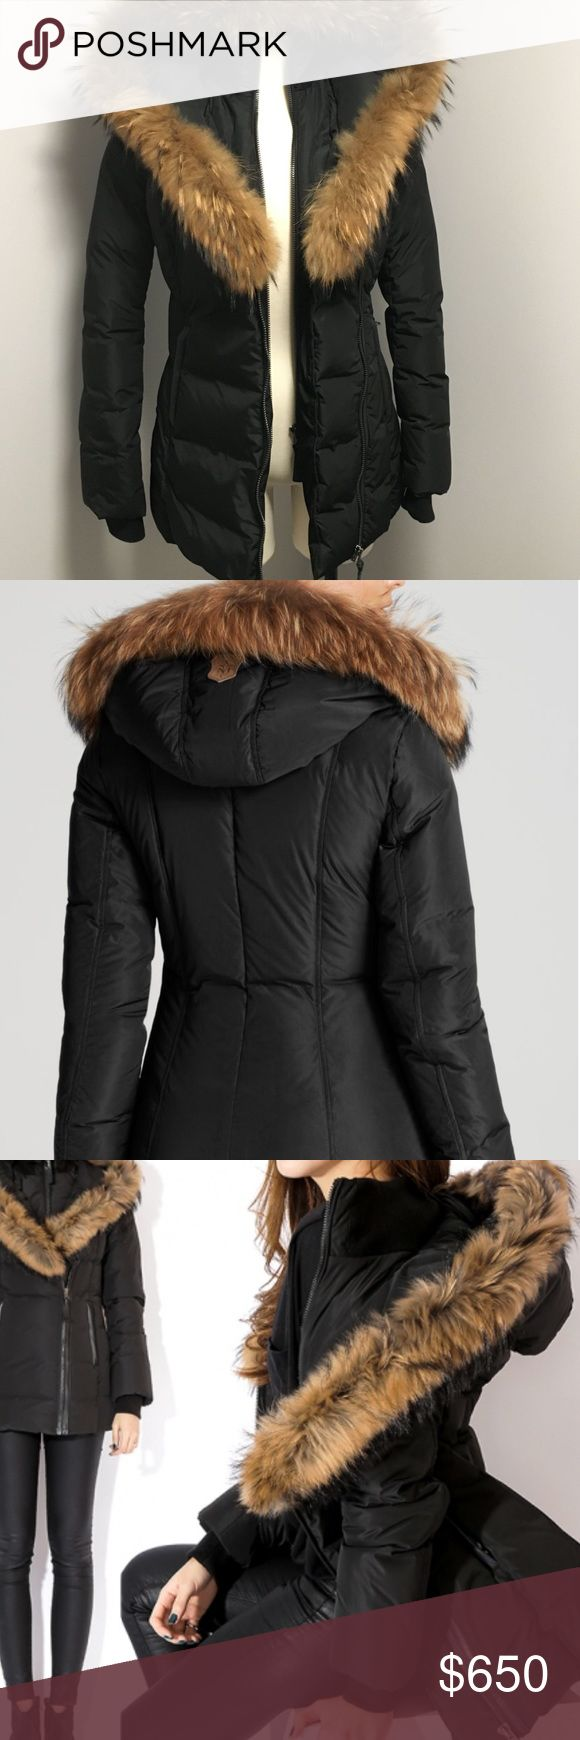 Mackage coat Coyote fur, Adali style. Mackage Jackets & Coats Puffers